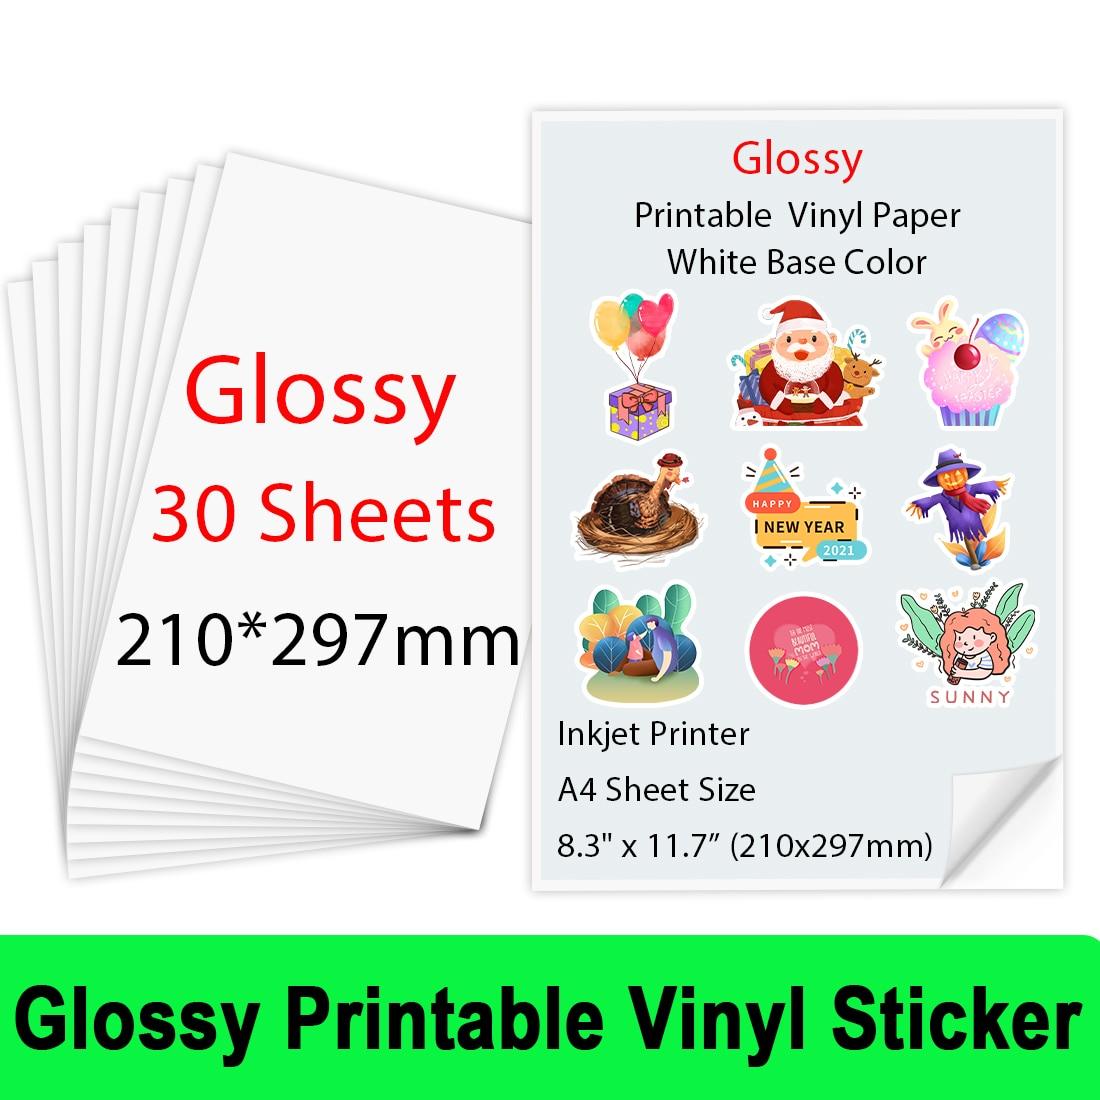 10 /30 Sheets A4 Glossy Self-Adhesive Printable Vinyl Sticker Paper 210*297mm Waterproof Copy Paper for Inkjet printer DIY gift